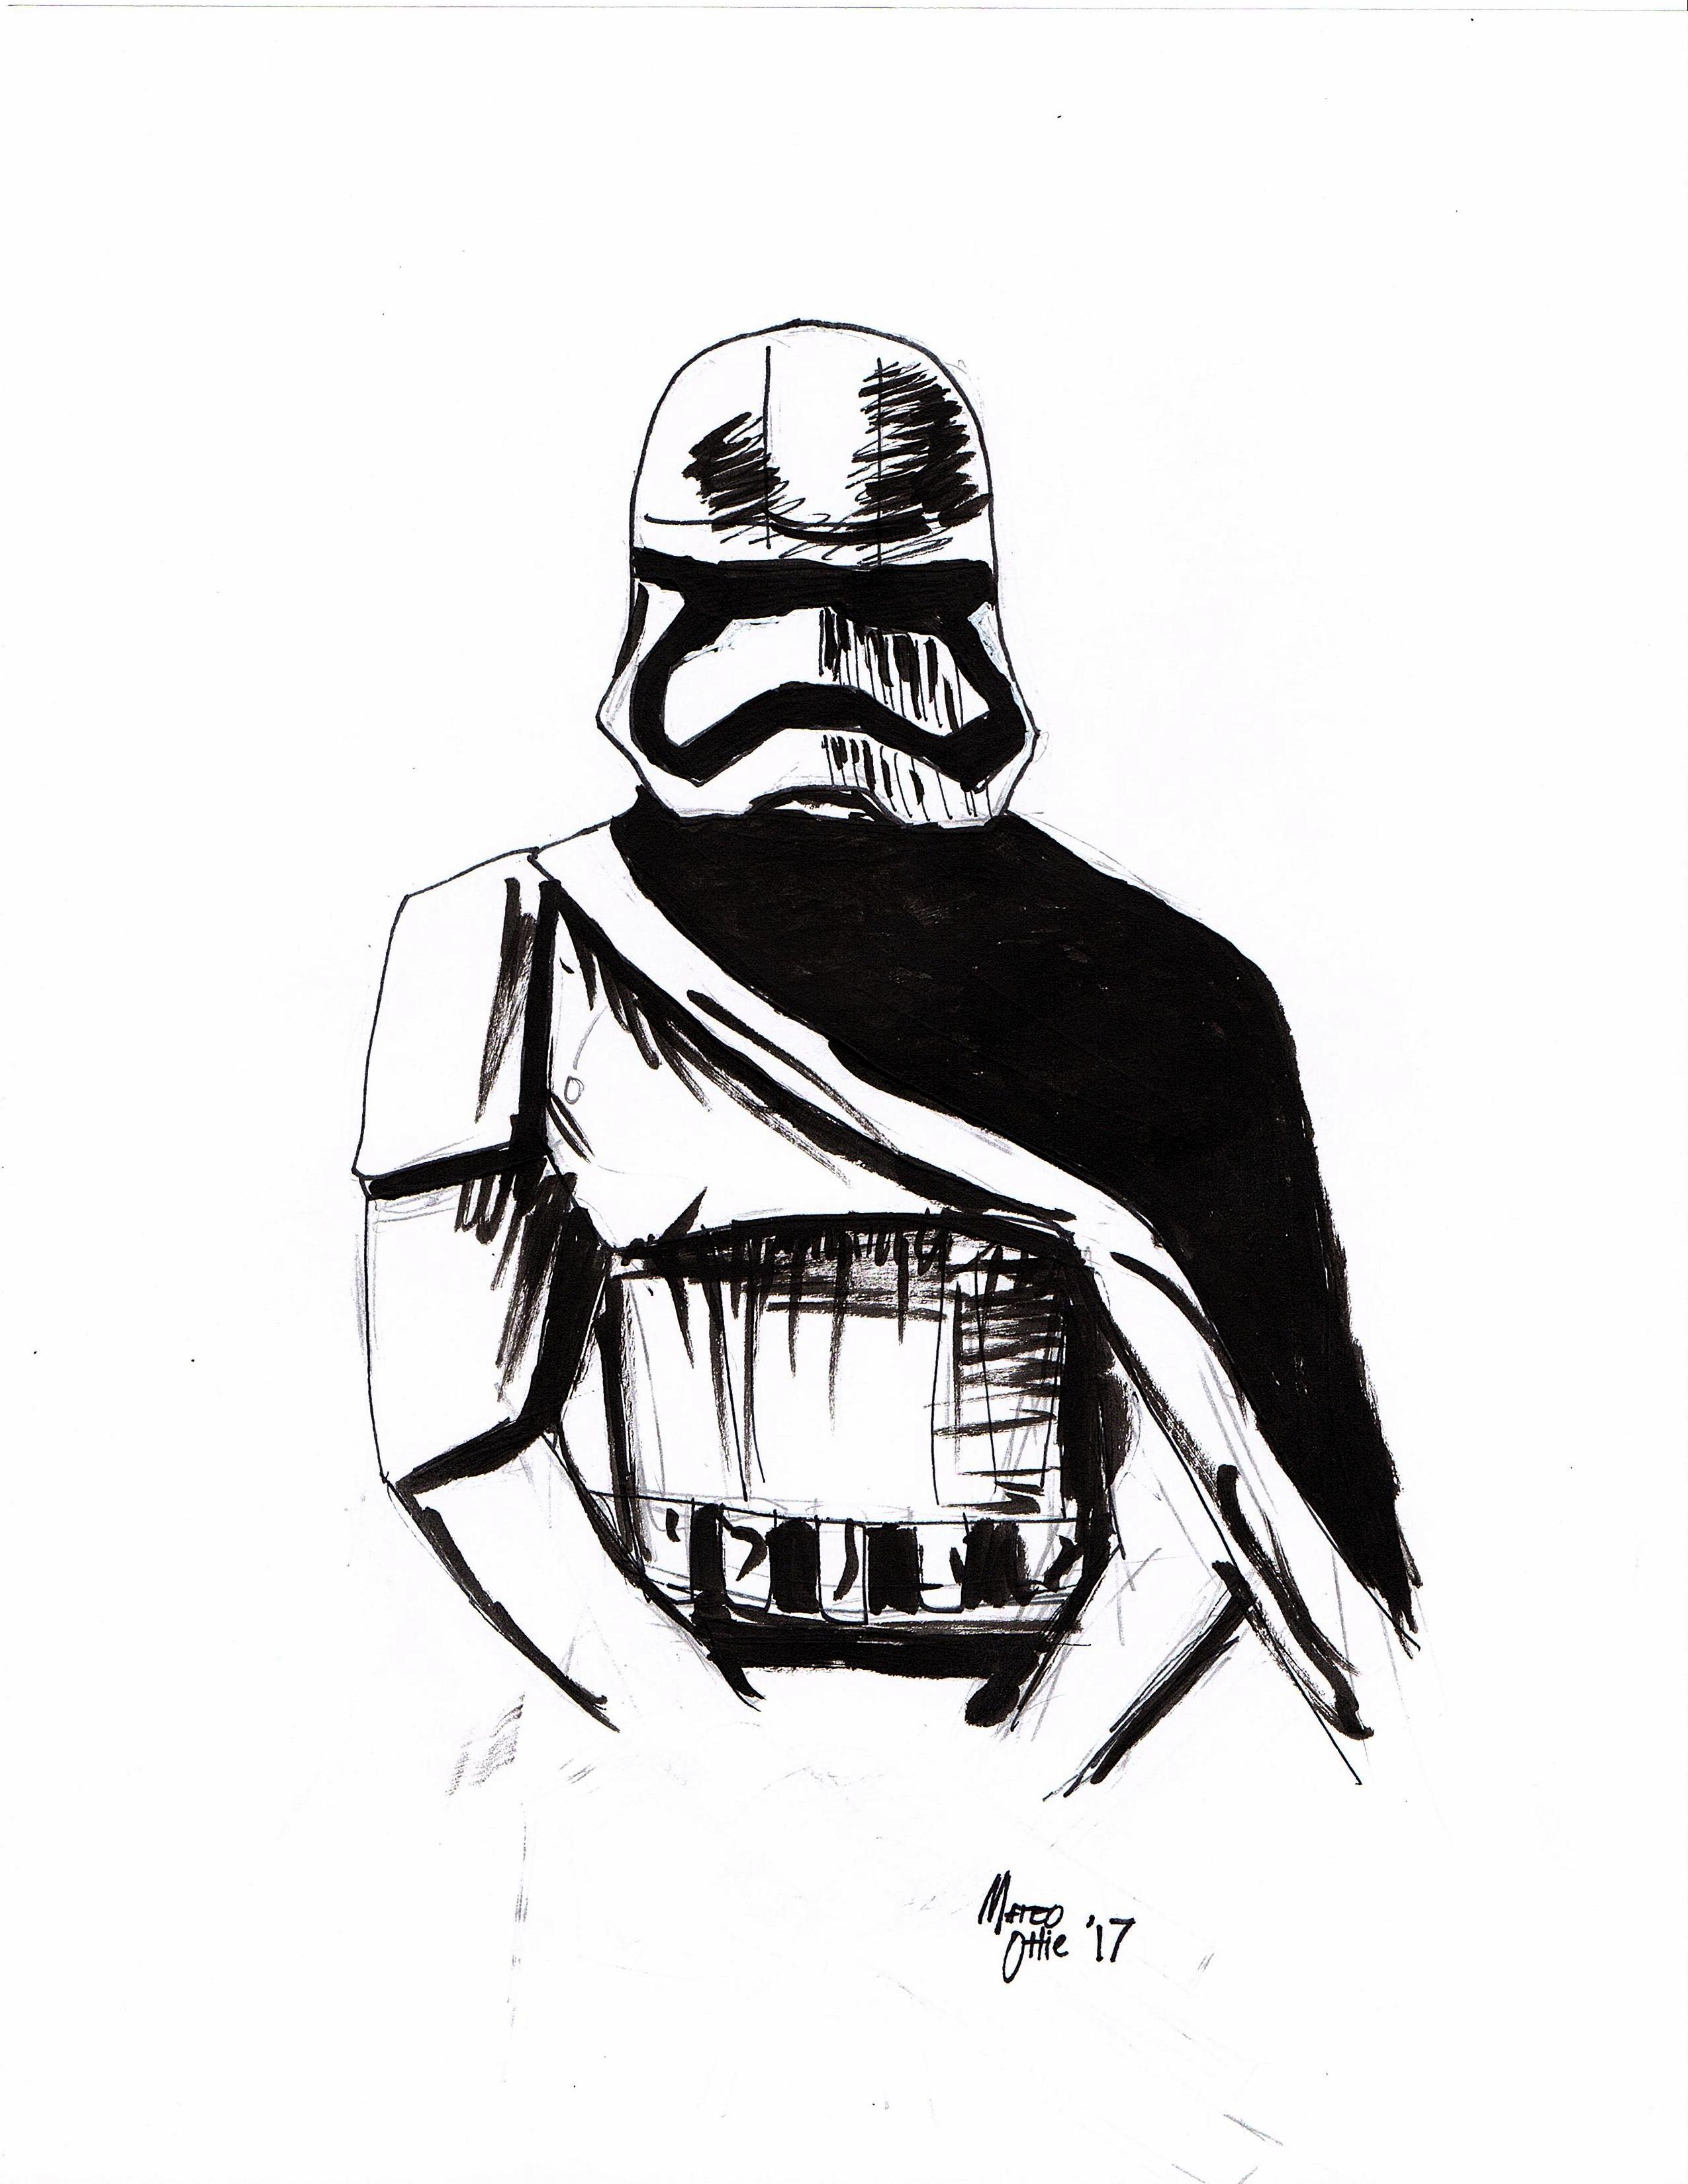 2550x3300 Drawings Of The Week Star Wars The Last Jedi Rockin'